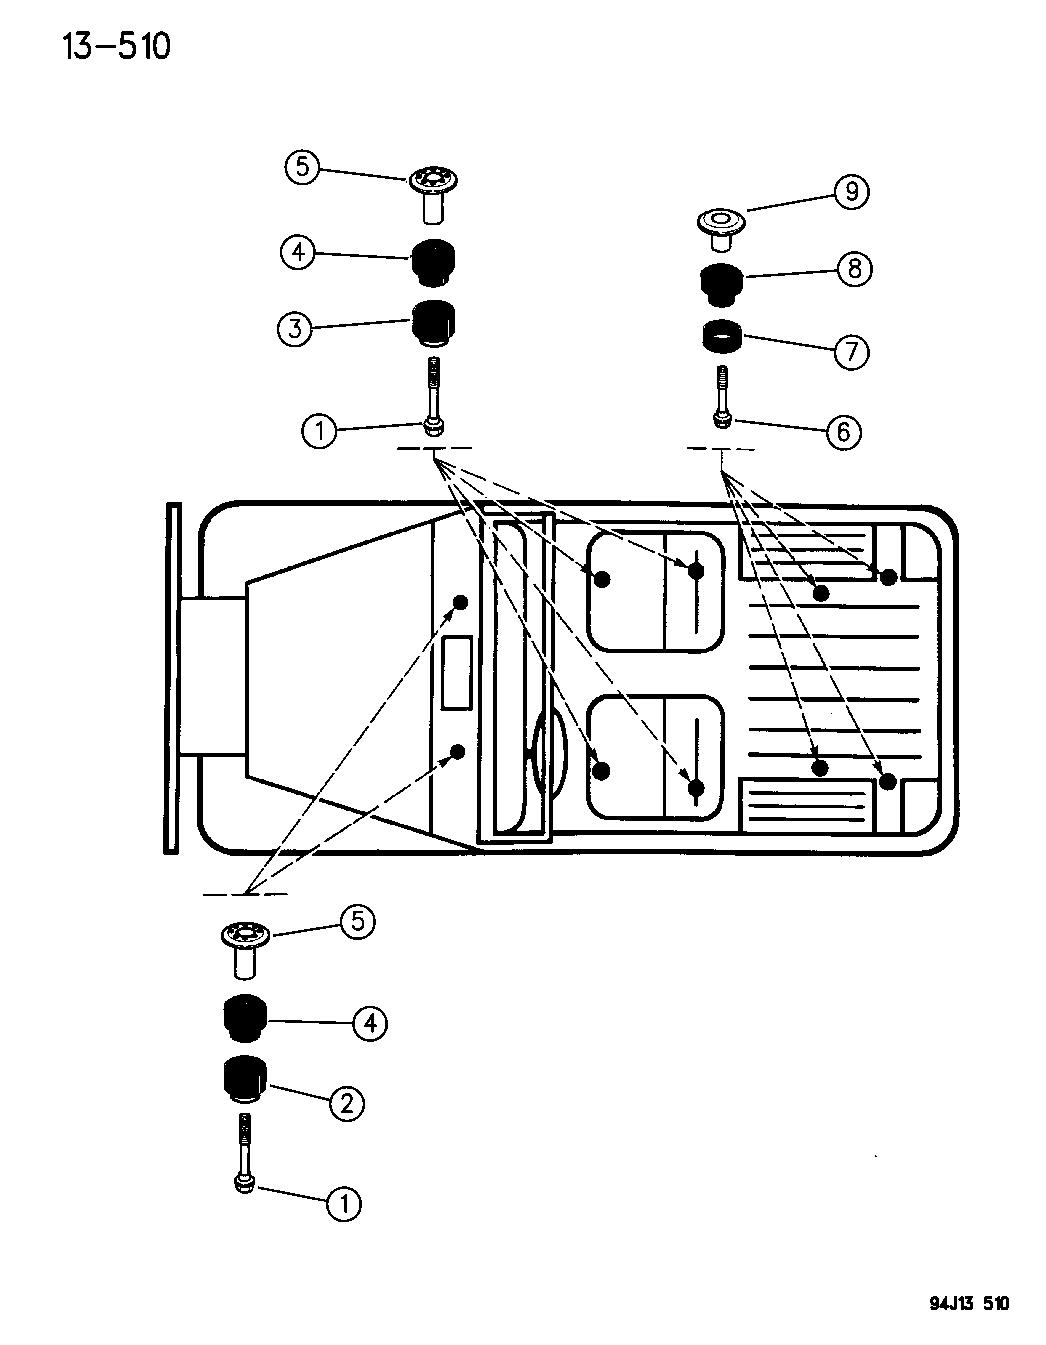 Jeep Wrangler Body Parts Diagram : Wiring Diagram: 31 Jeep